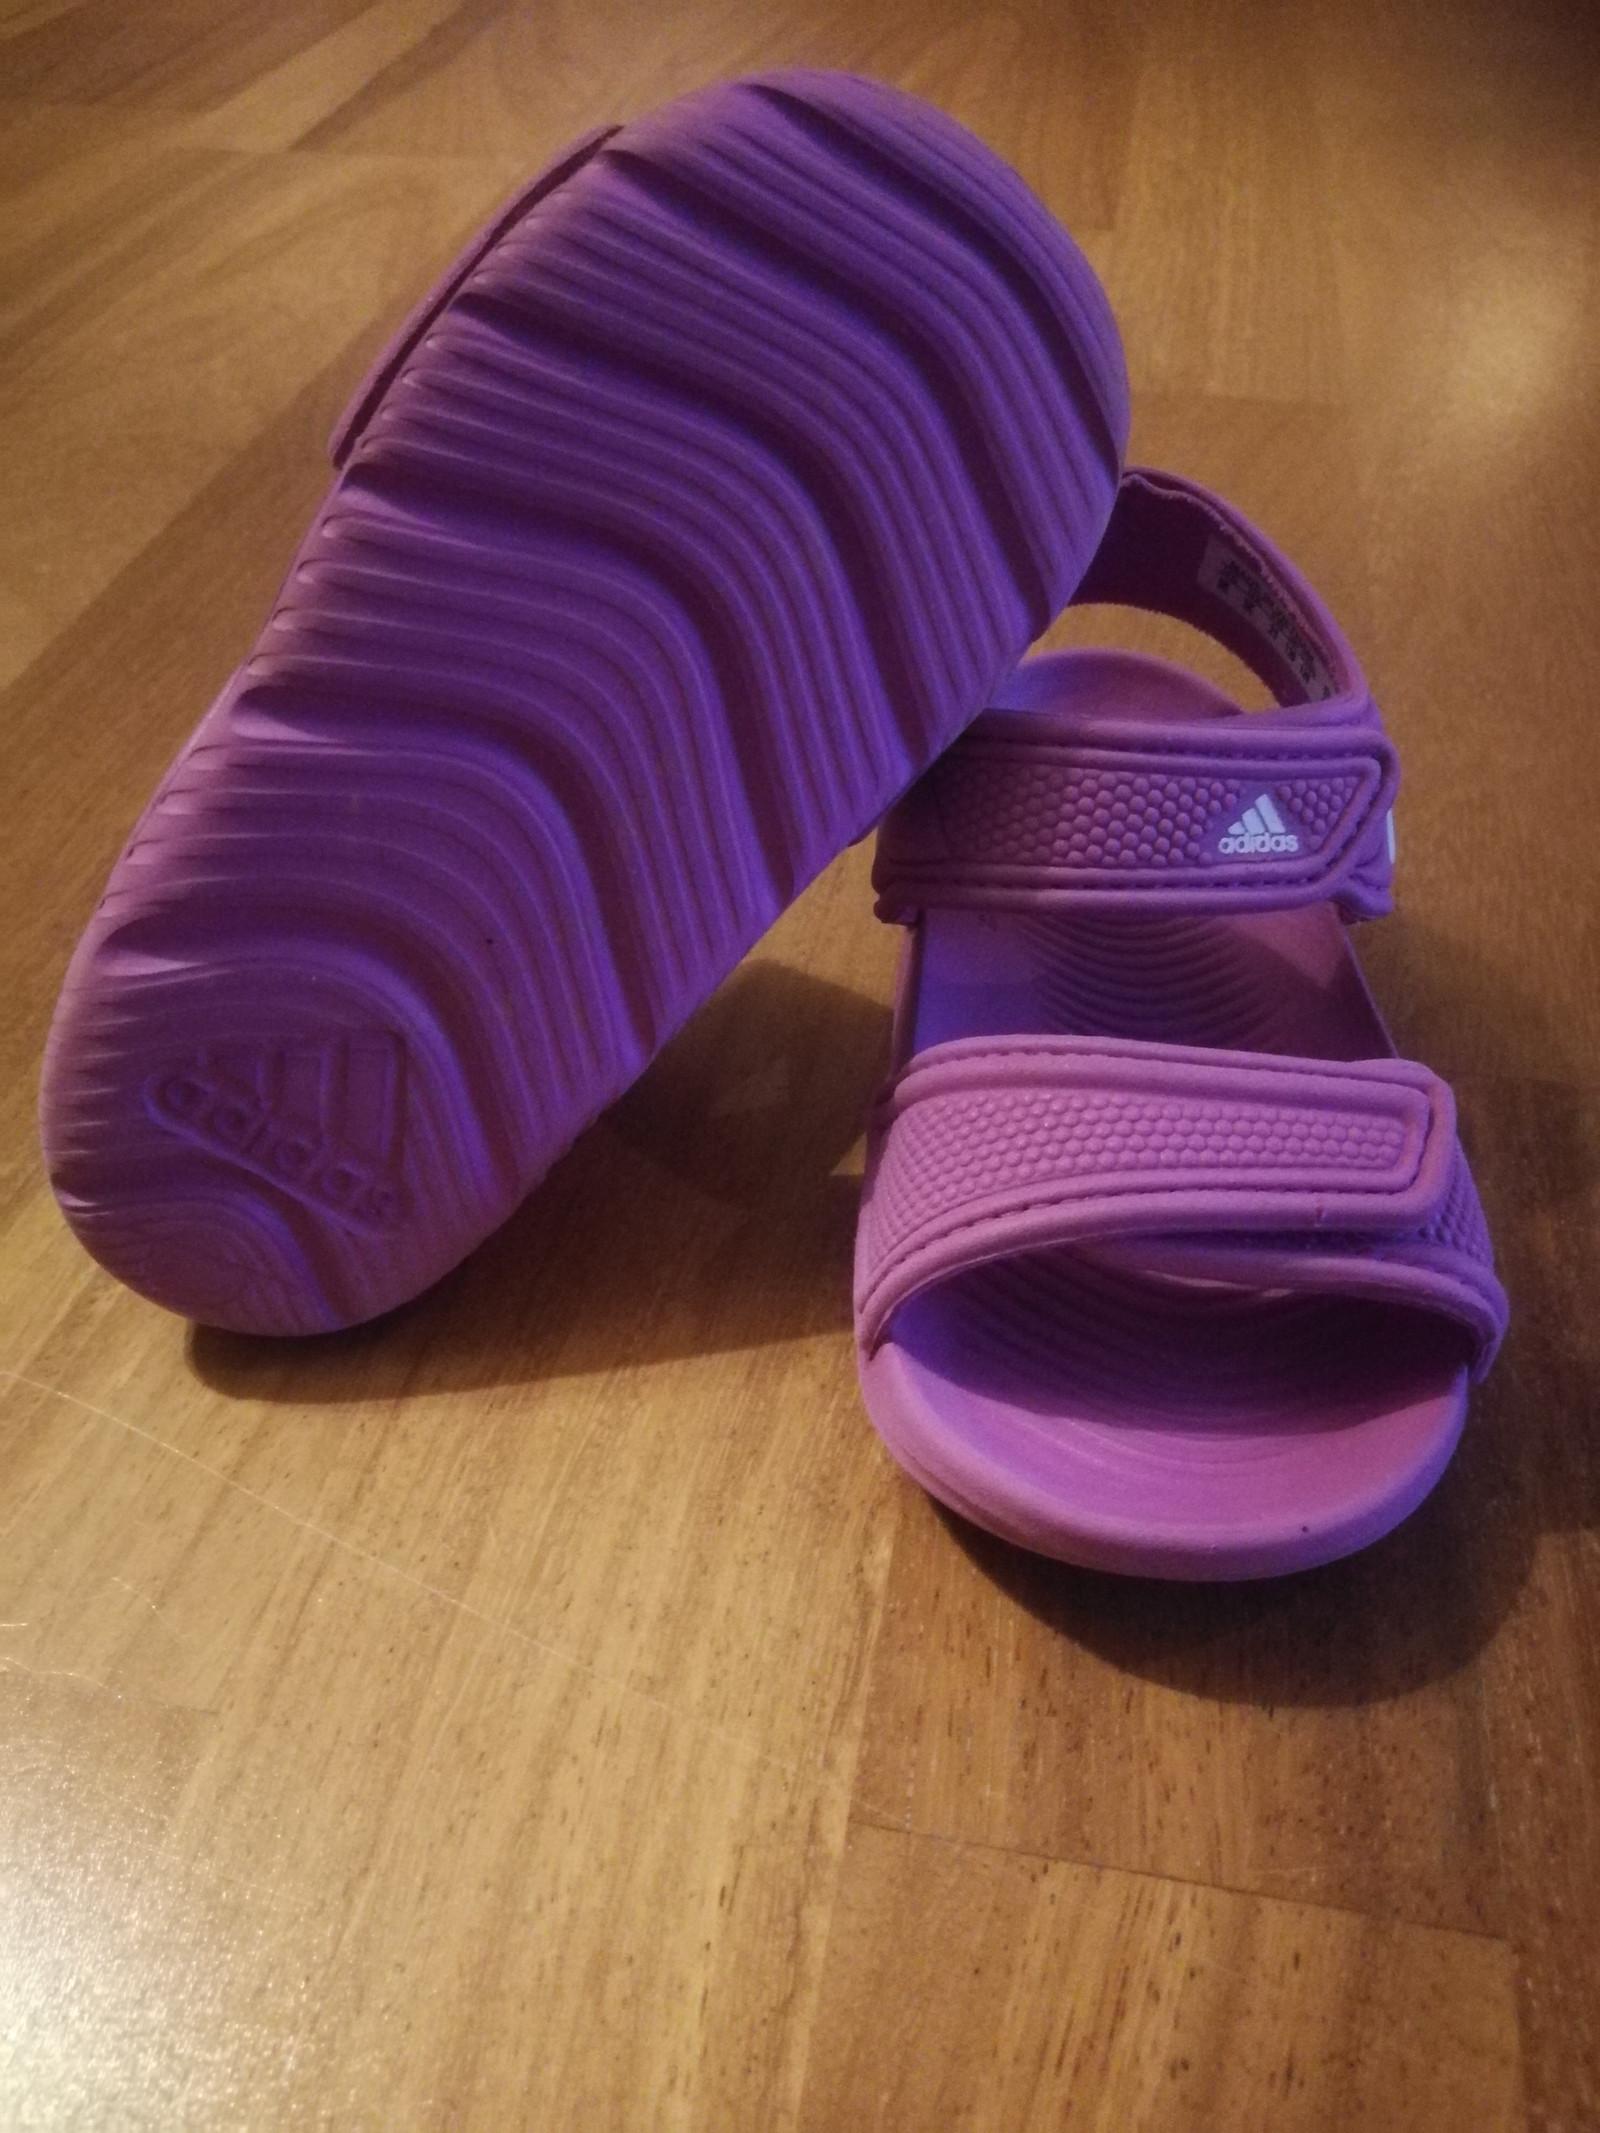 Adidas slippers badesko str K11   FINN.no